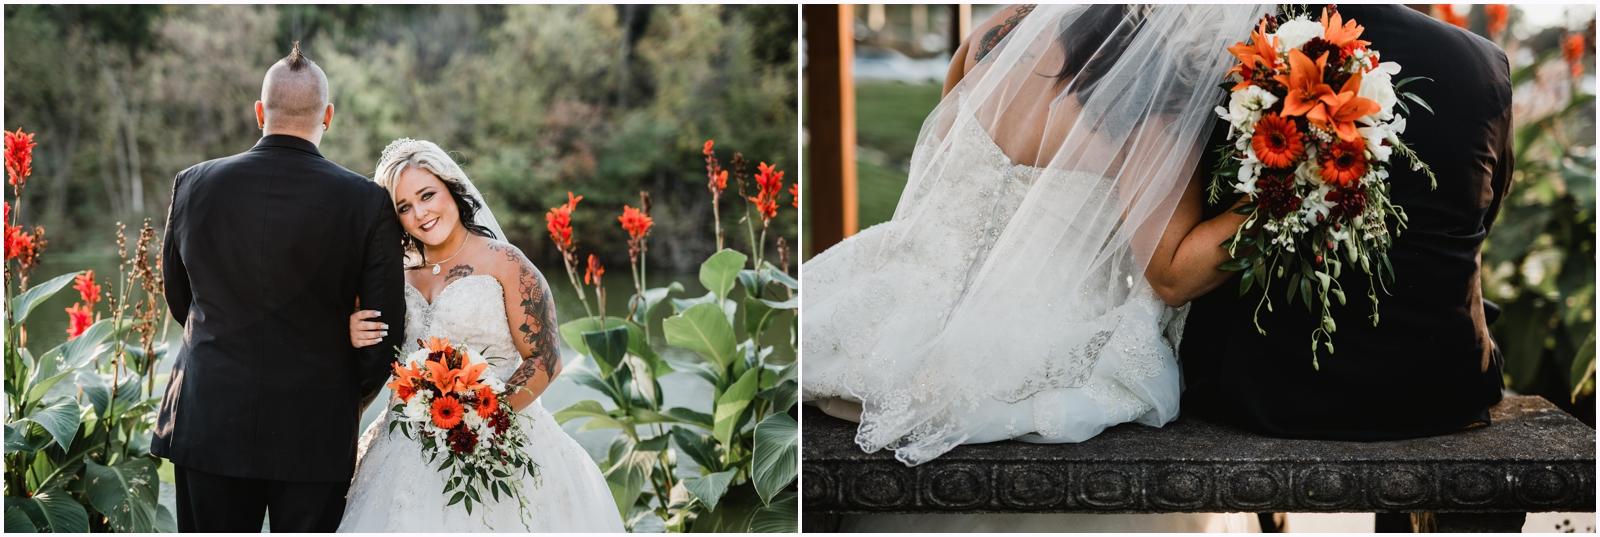 wedding_jamie_leonard_photography_greensburg_pittsburgh.jpg